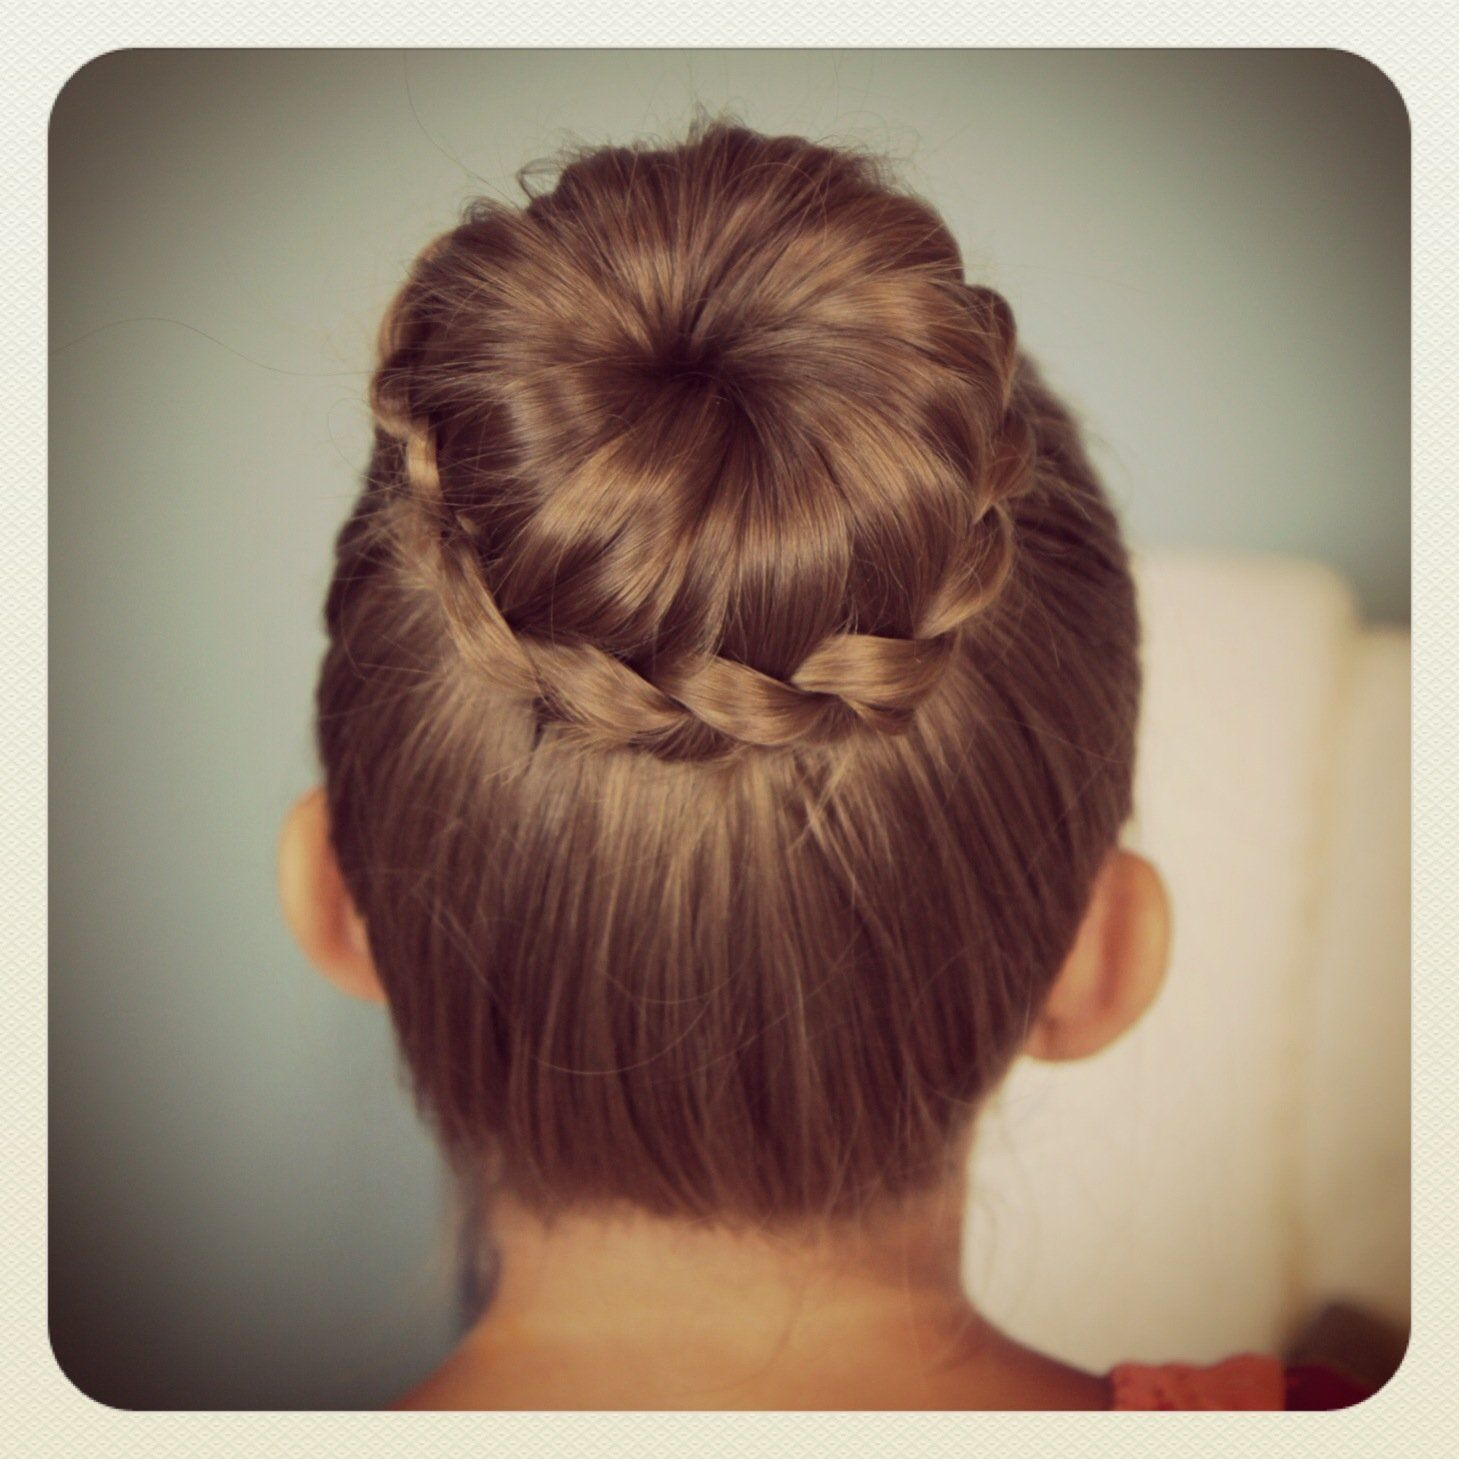 Flower Girl French Braid Hairstyles Lace Braided Bun Cute Updo